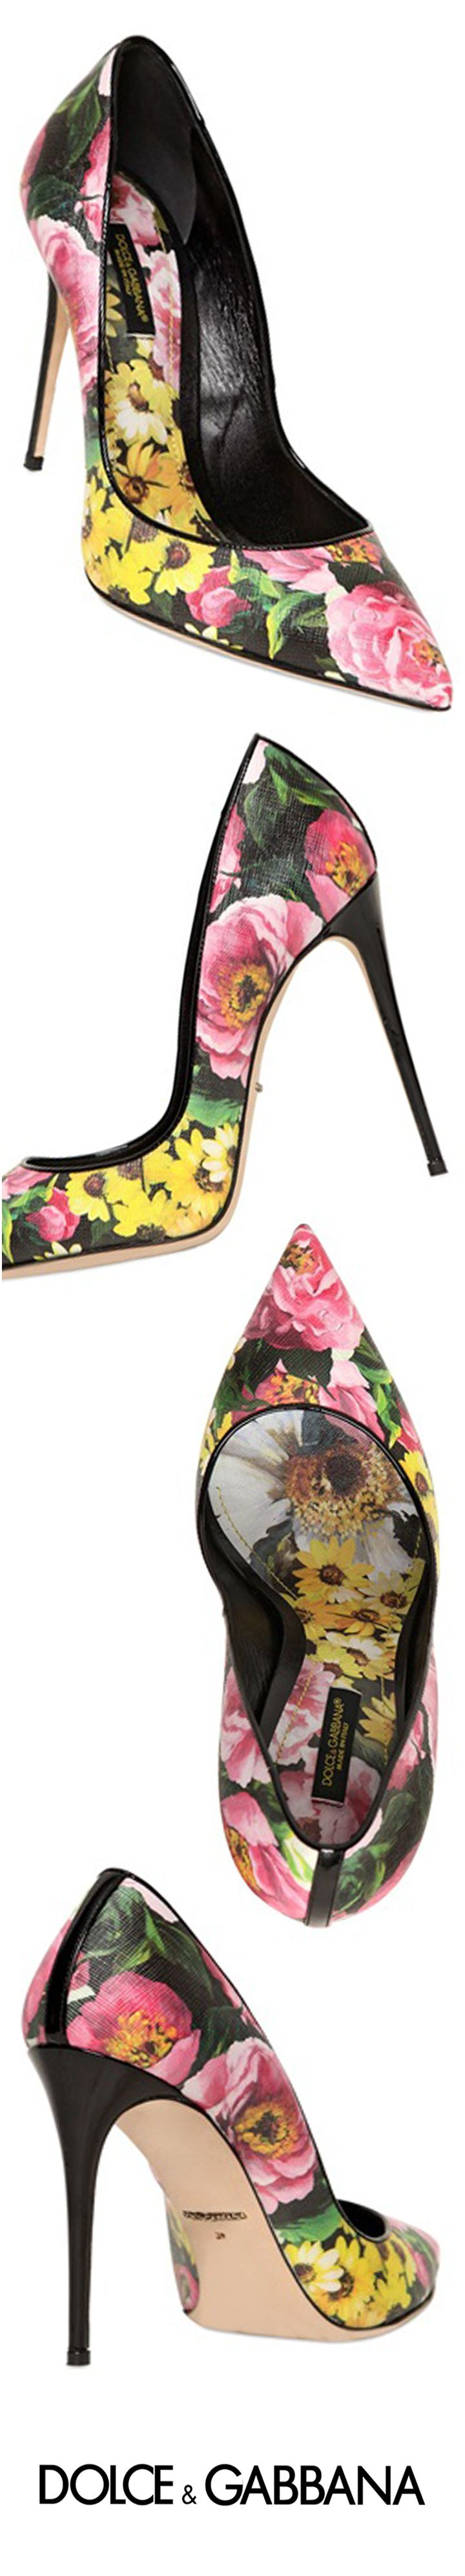 Dolce & Gabbana | SS 2015 | cynthia reccord